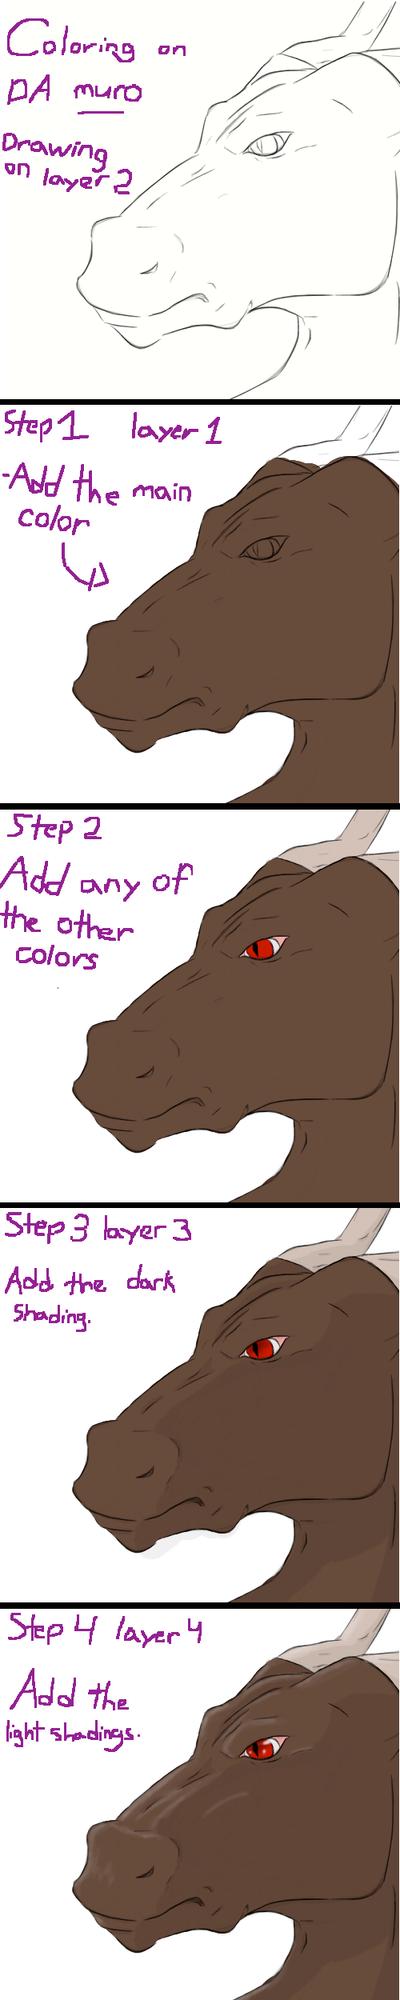 coloring on muro tutorial by nightwindwolf95